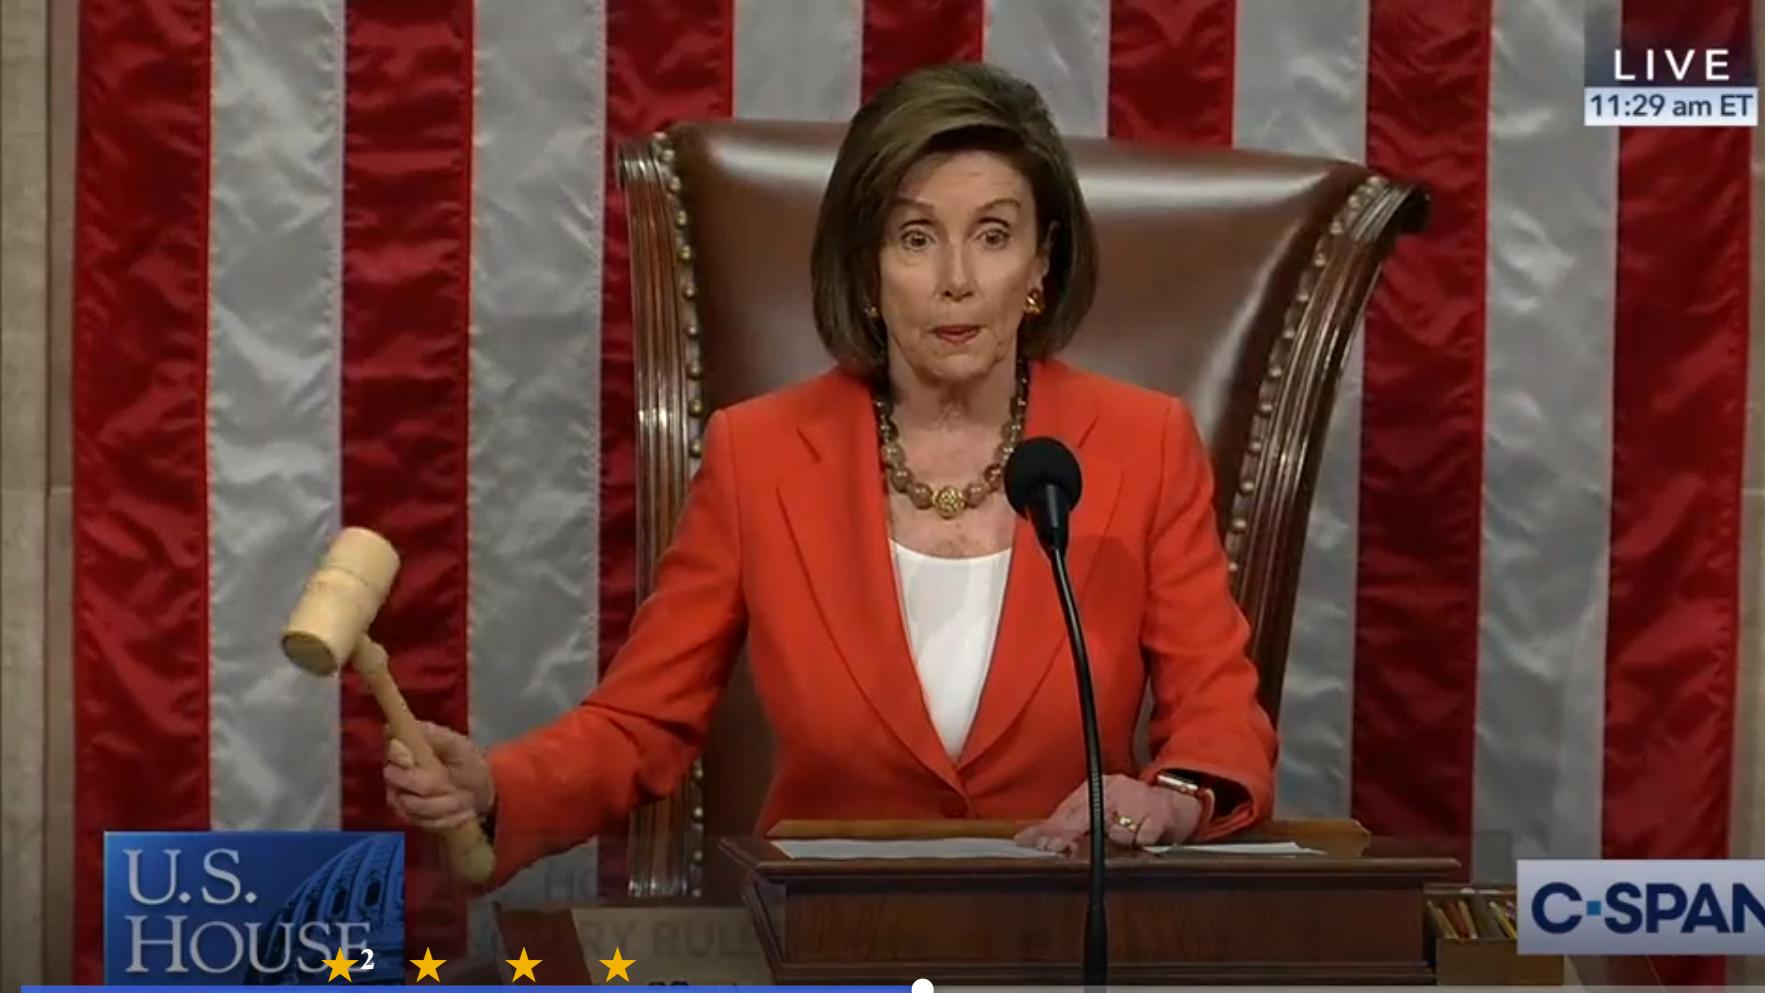 CT lawmakers praise impeachment resolution the GOP calls a  'sham'